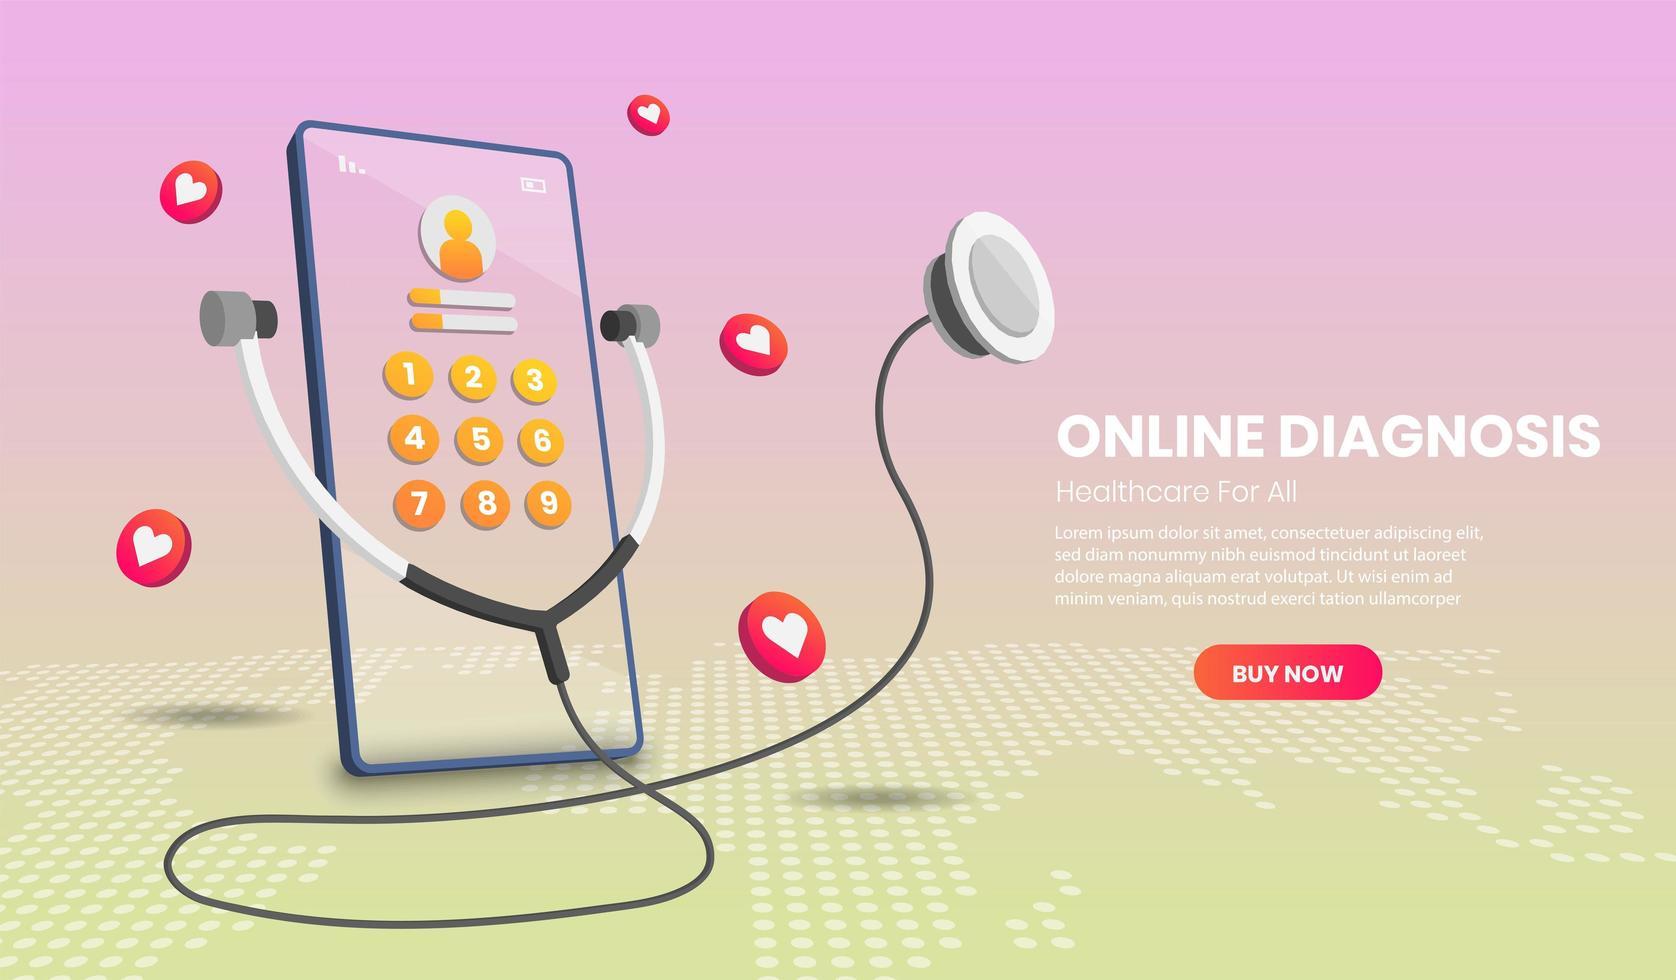 Online-Diagnose mit Telefon vektor